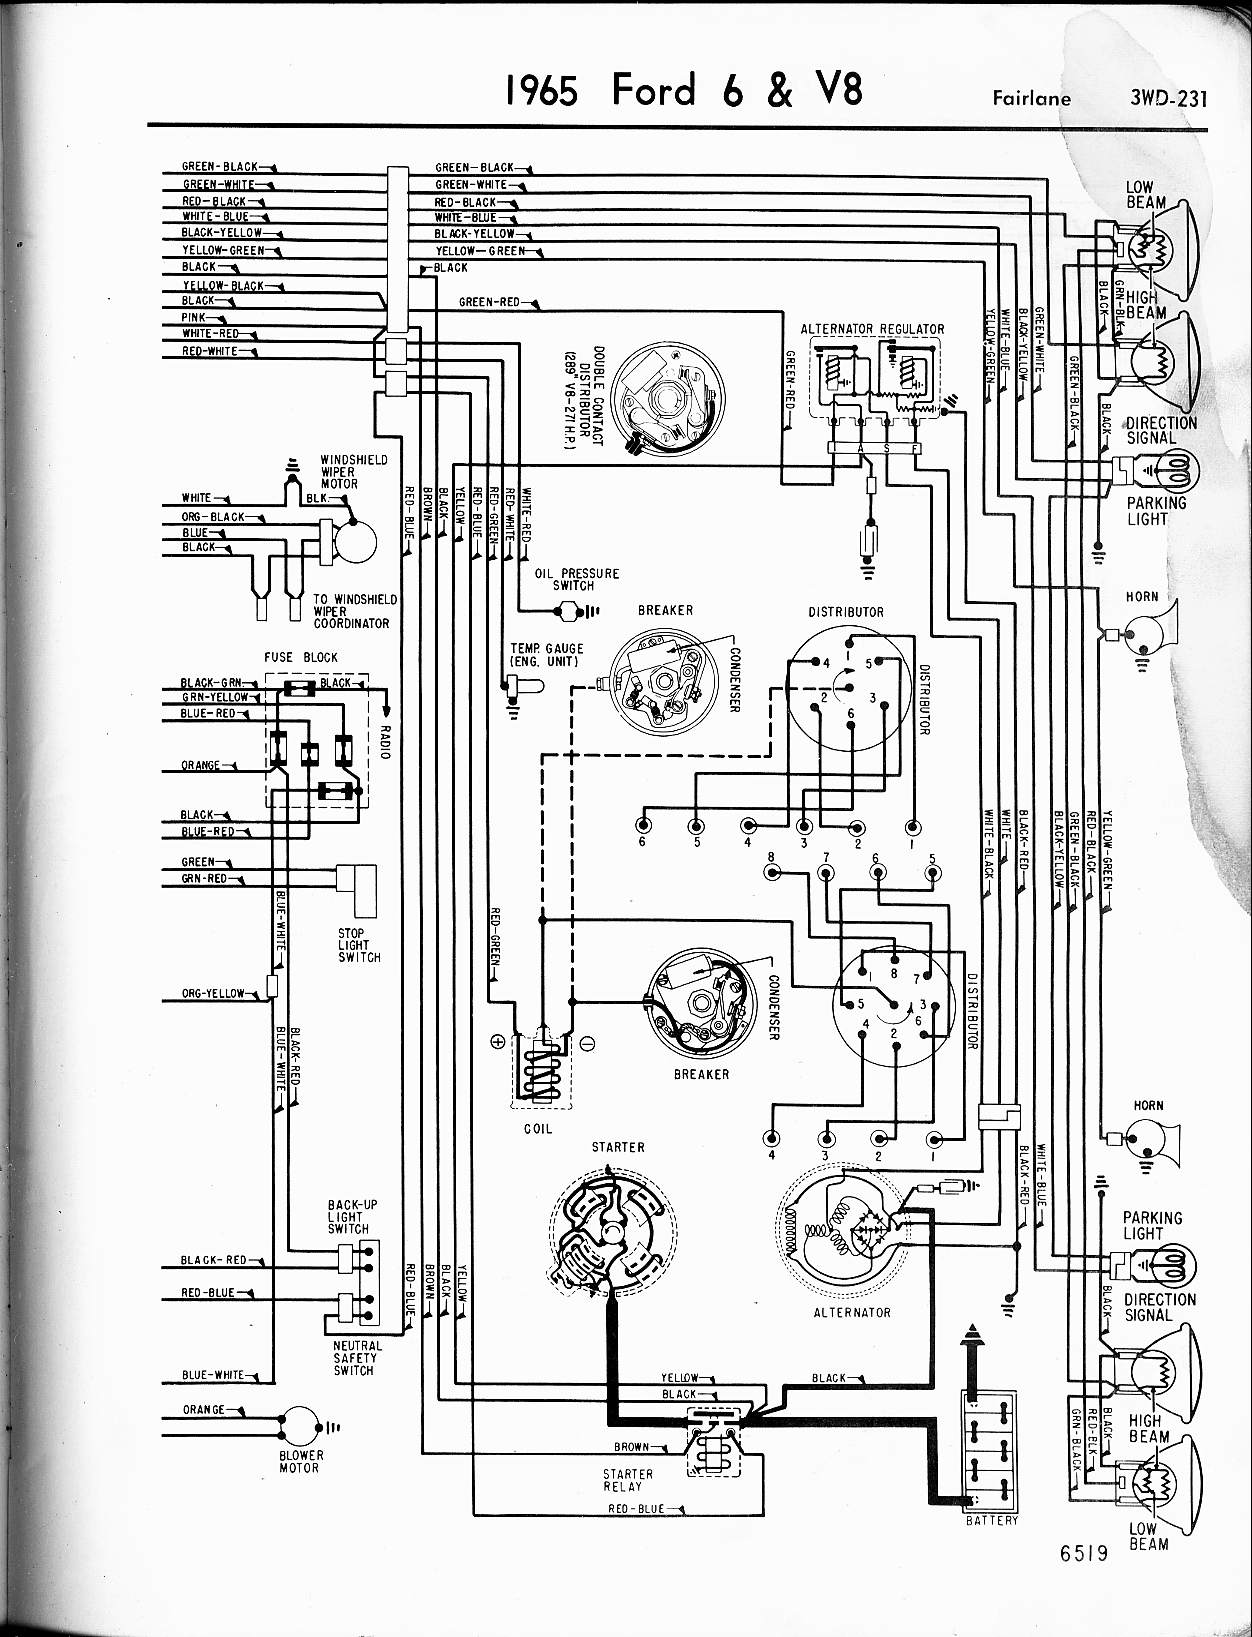 Peachy 57 65 Ford Wiring Diagrams Wiring Cloud Monangrecoveryedborg